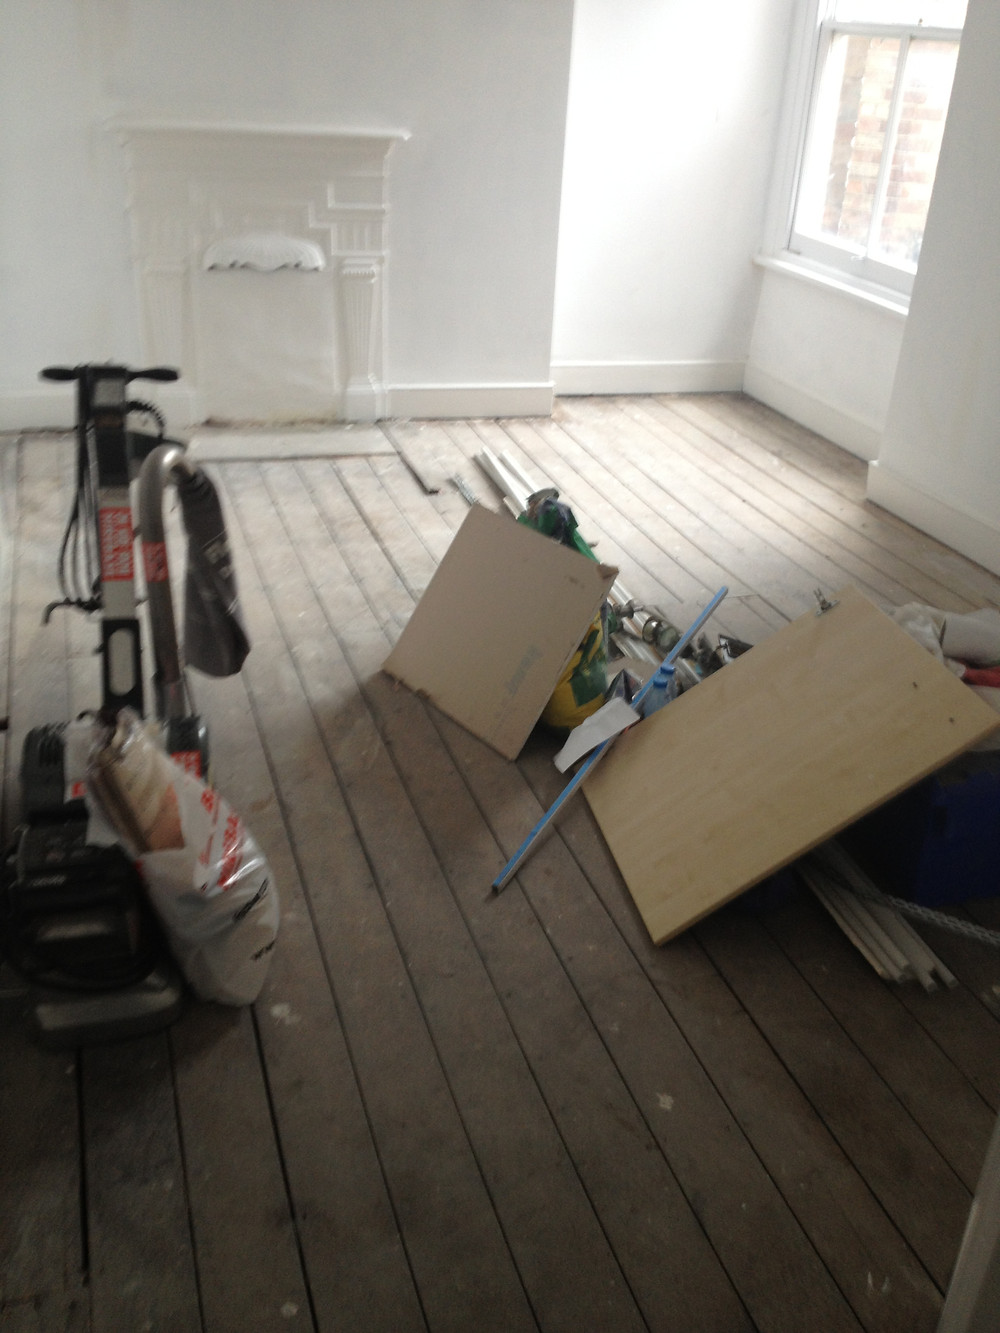 Floor boards and industrial sander at start of work